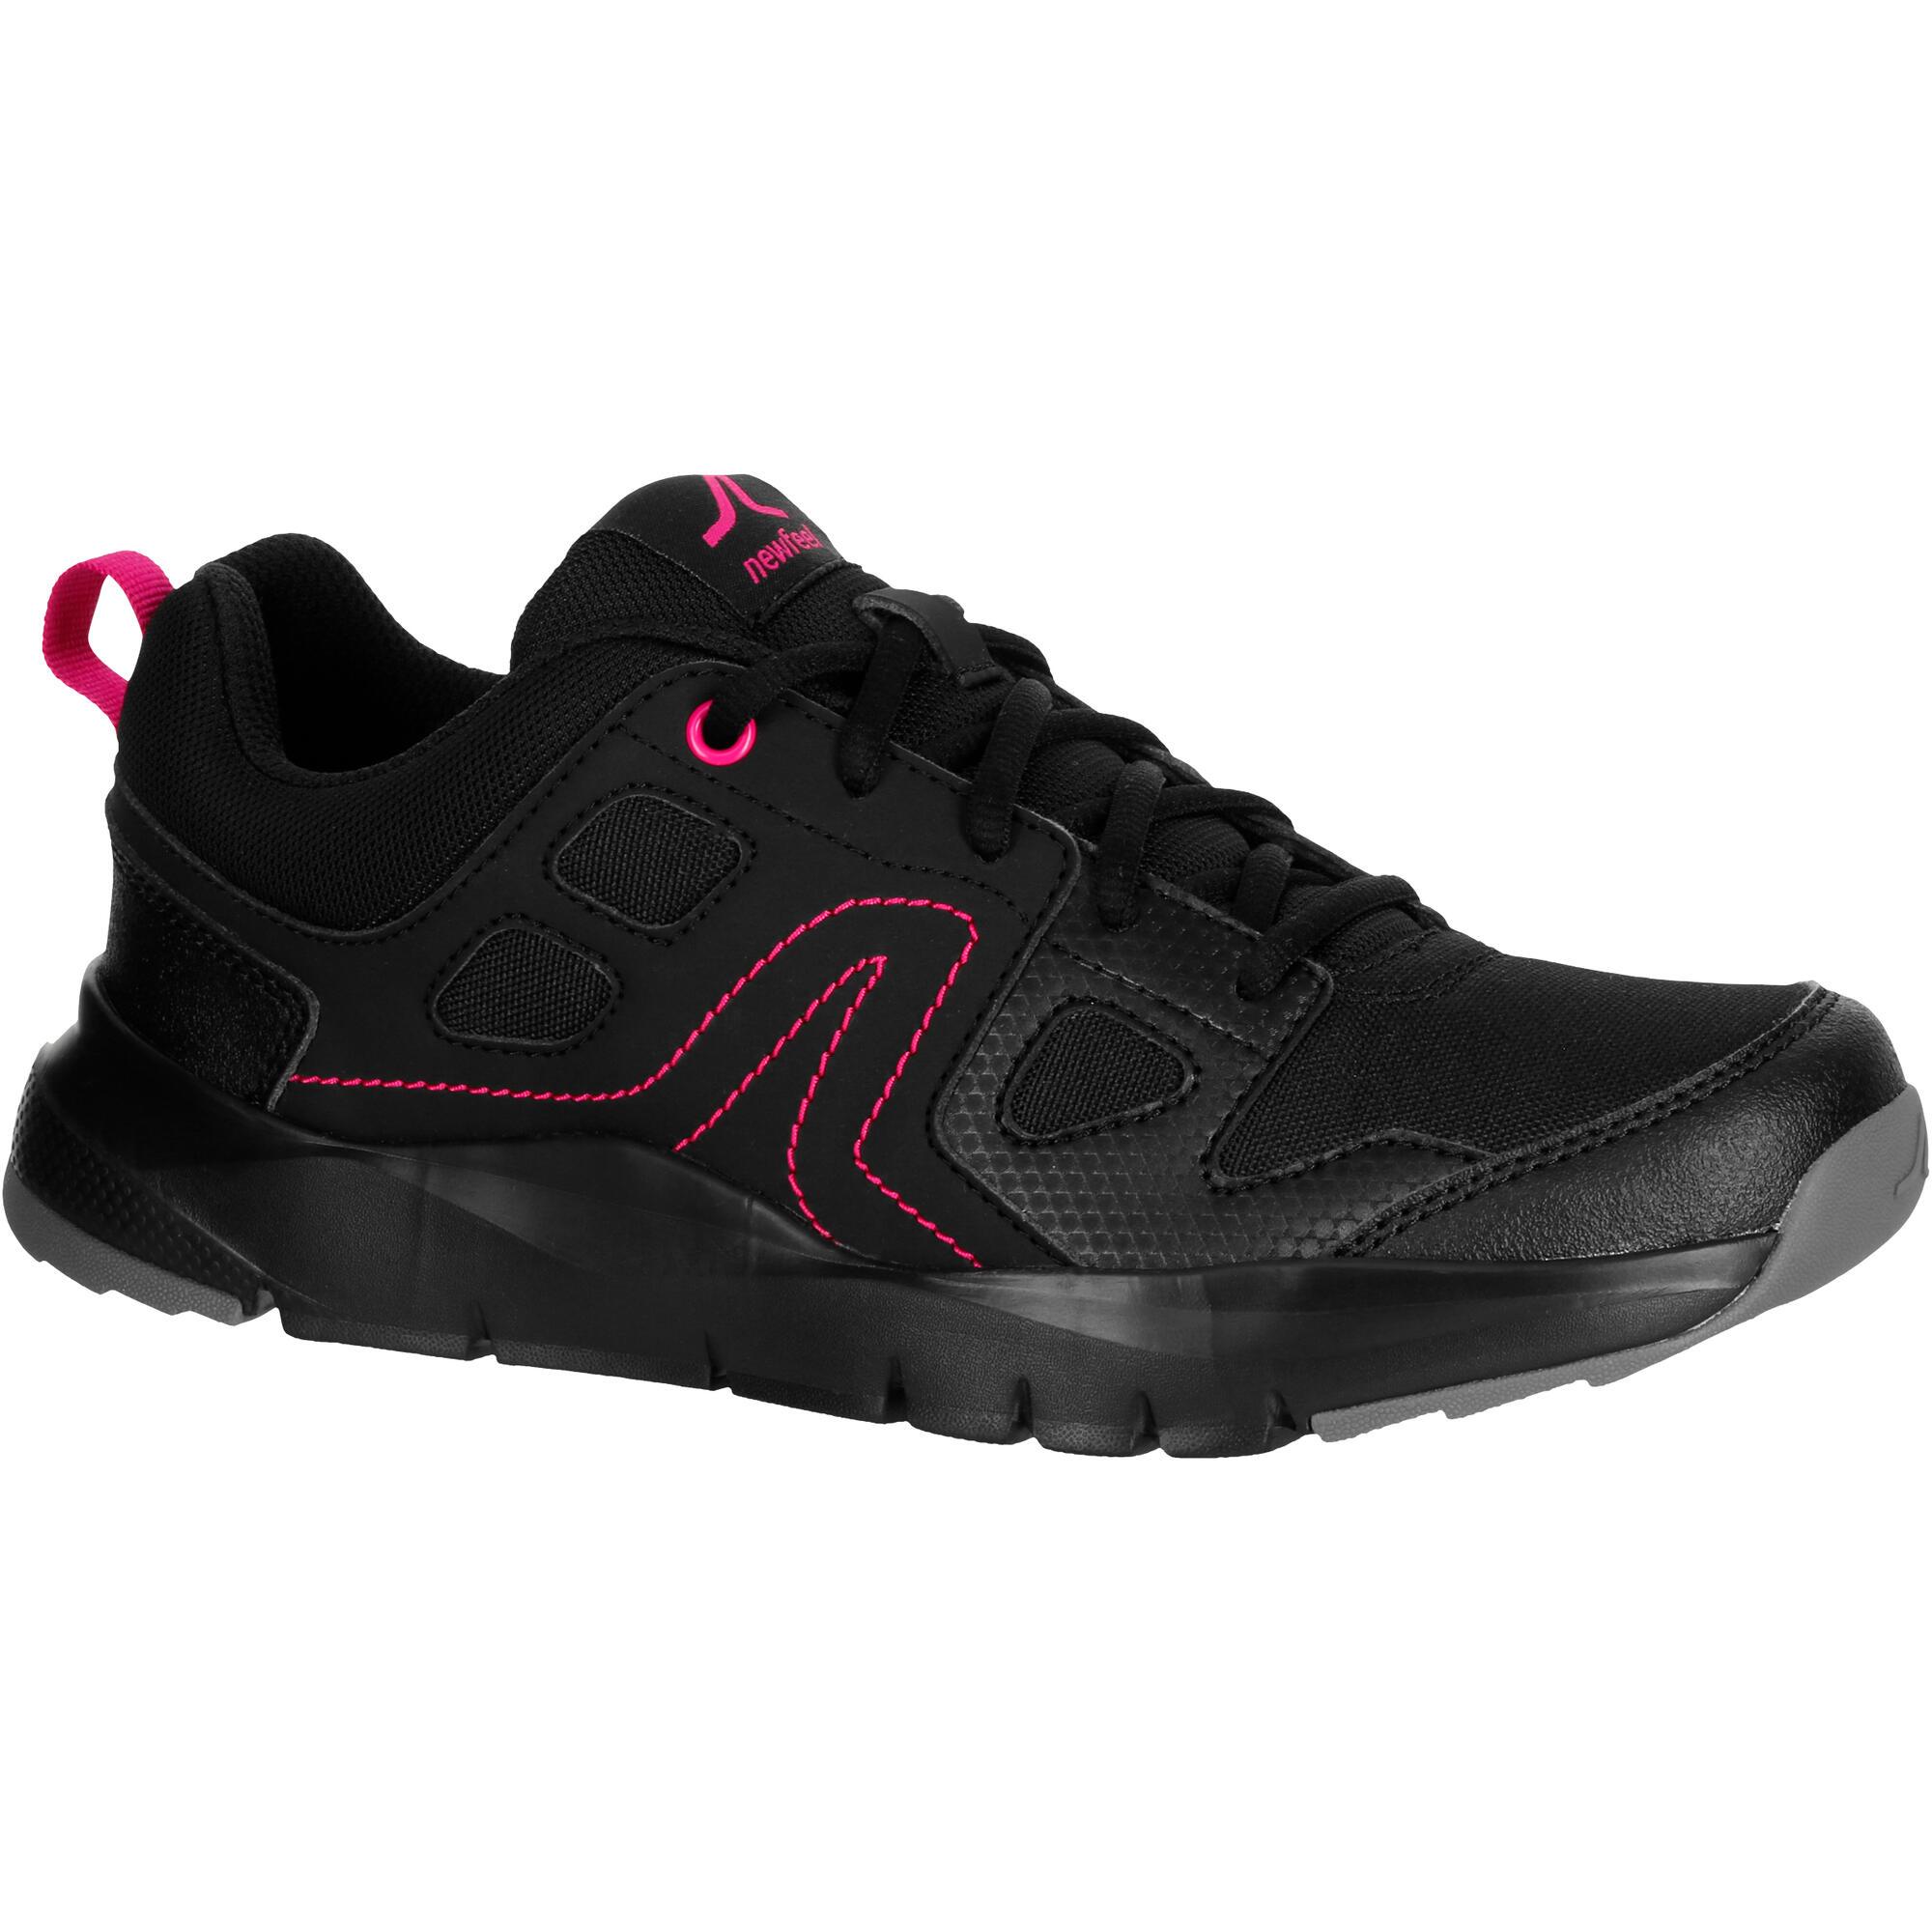 Sportive Id6rwiqpeddler Marche De Newfeel Femme Chaussures 8wvmnON0y